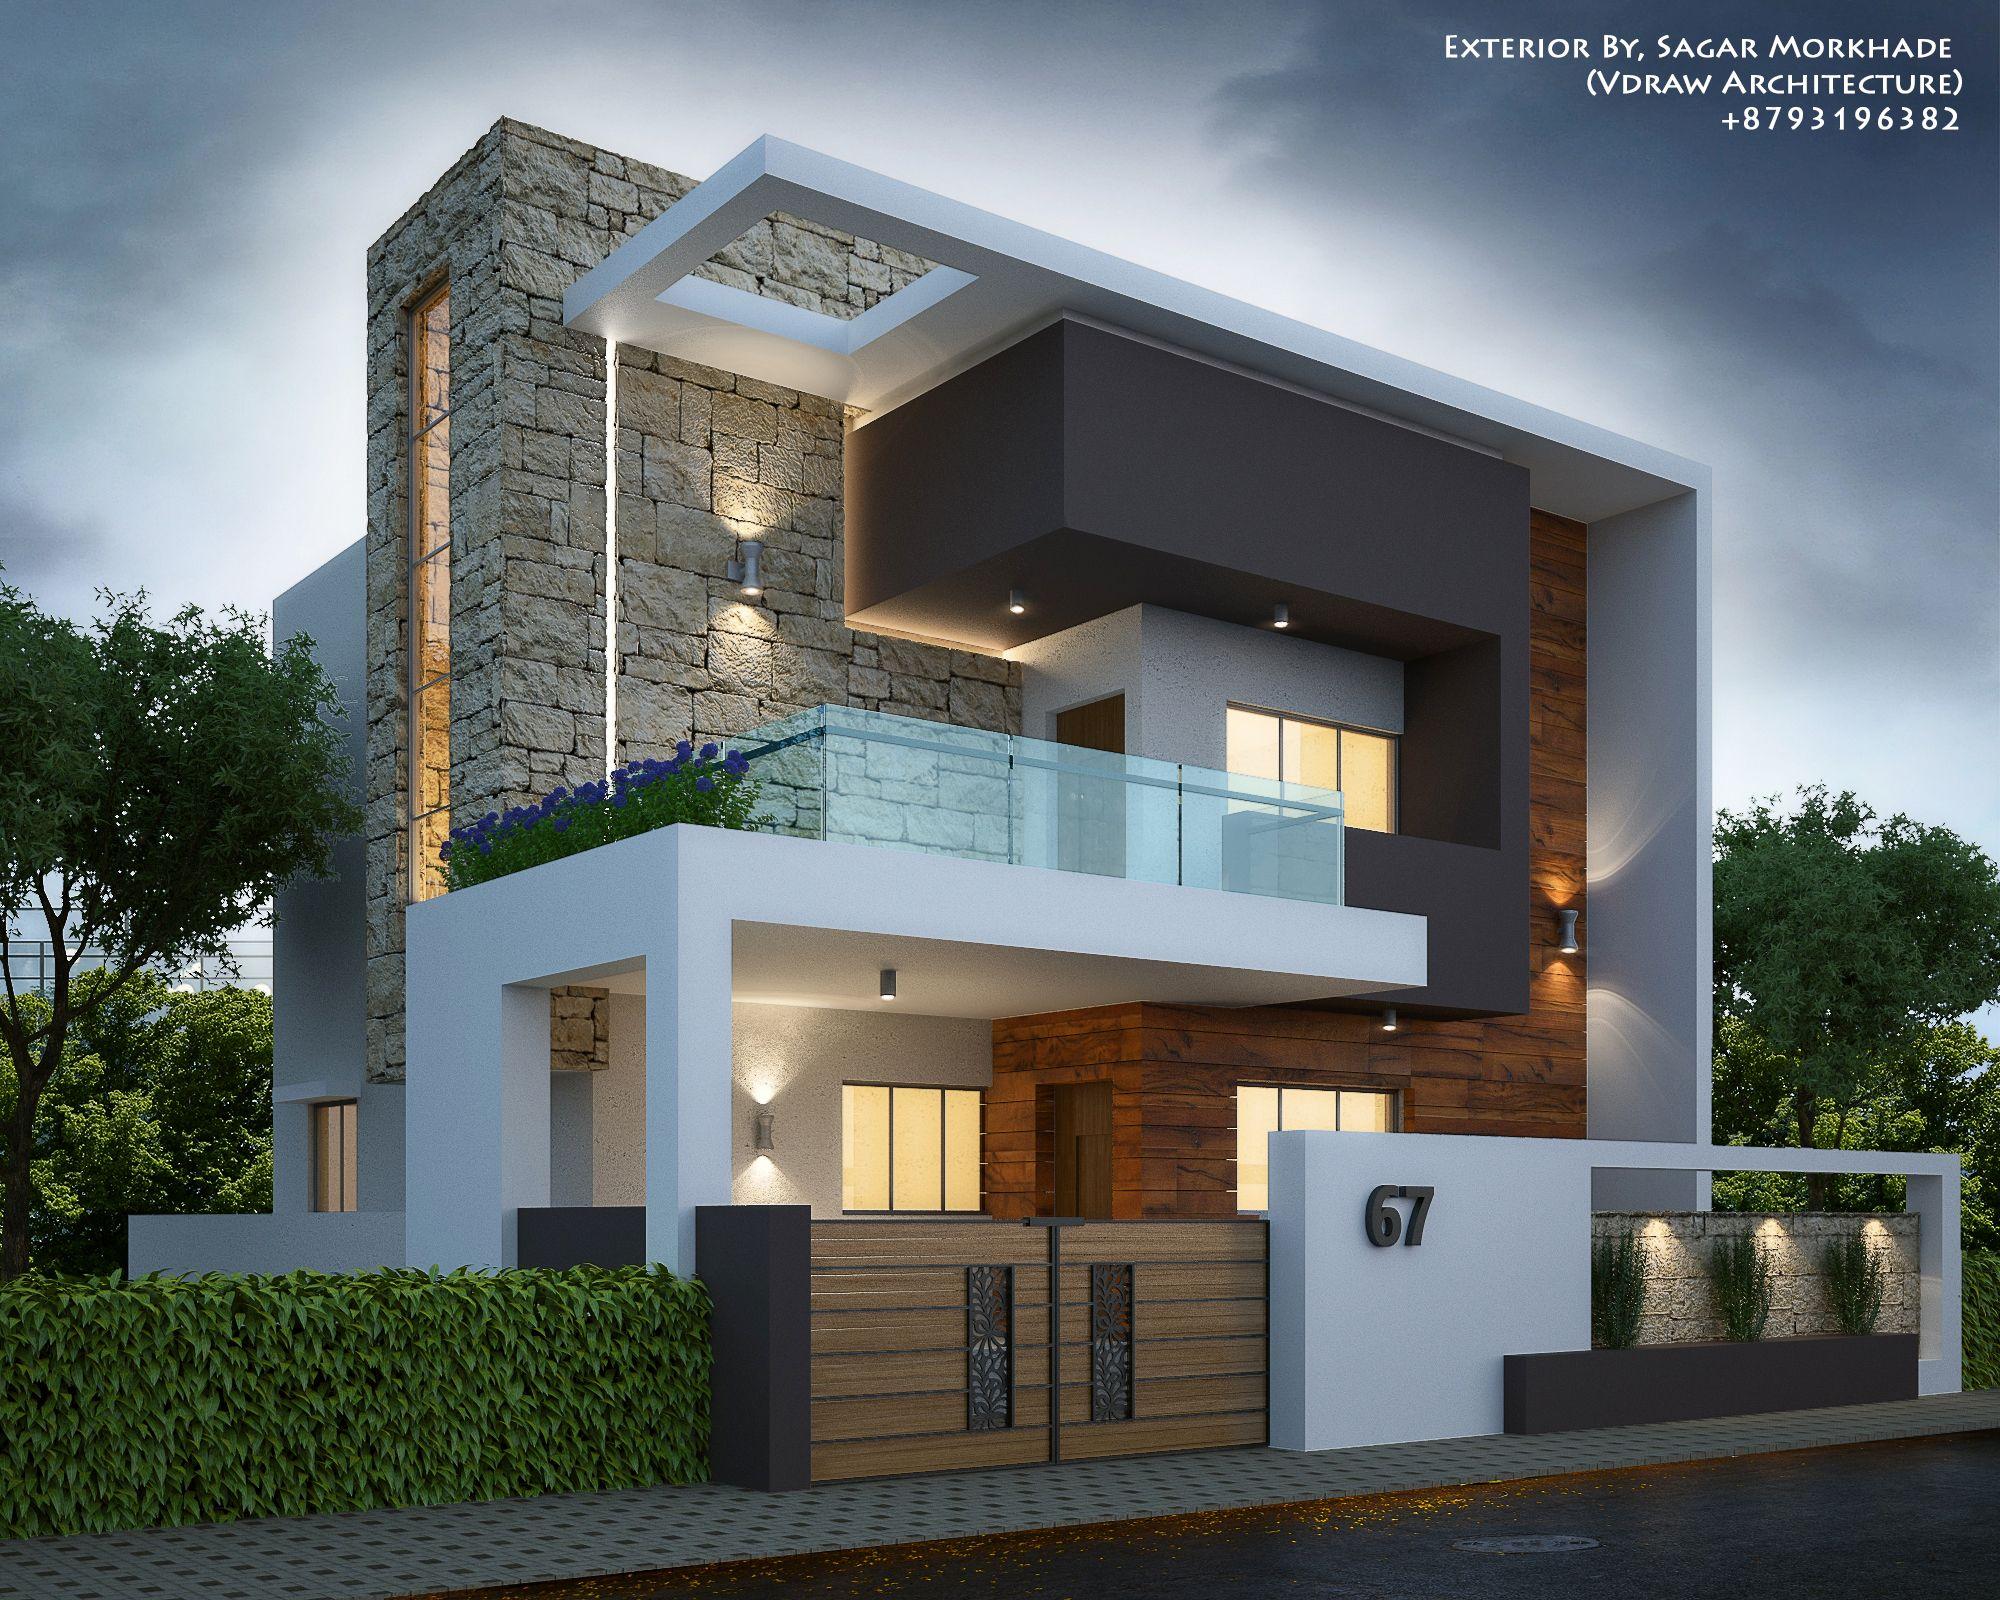 Modern residential exterior by sagar morkhade vdraw architecture 91 8793196382 idalecio - Archi moderni casa ...